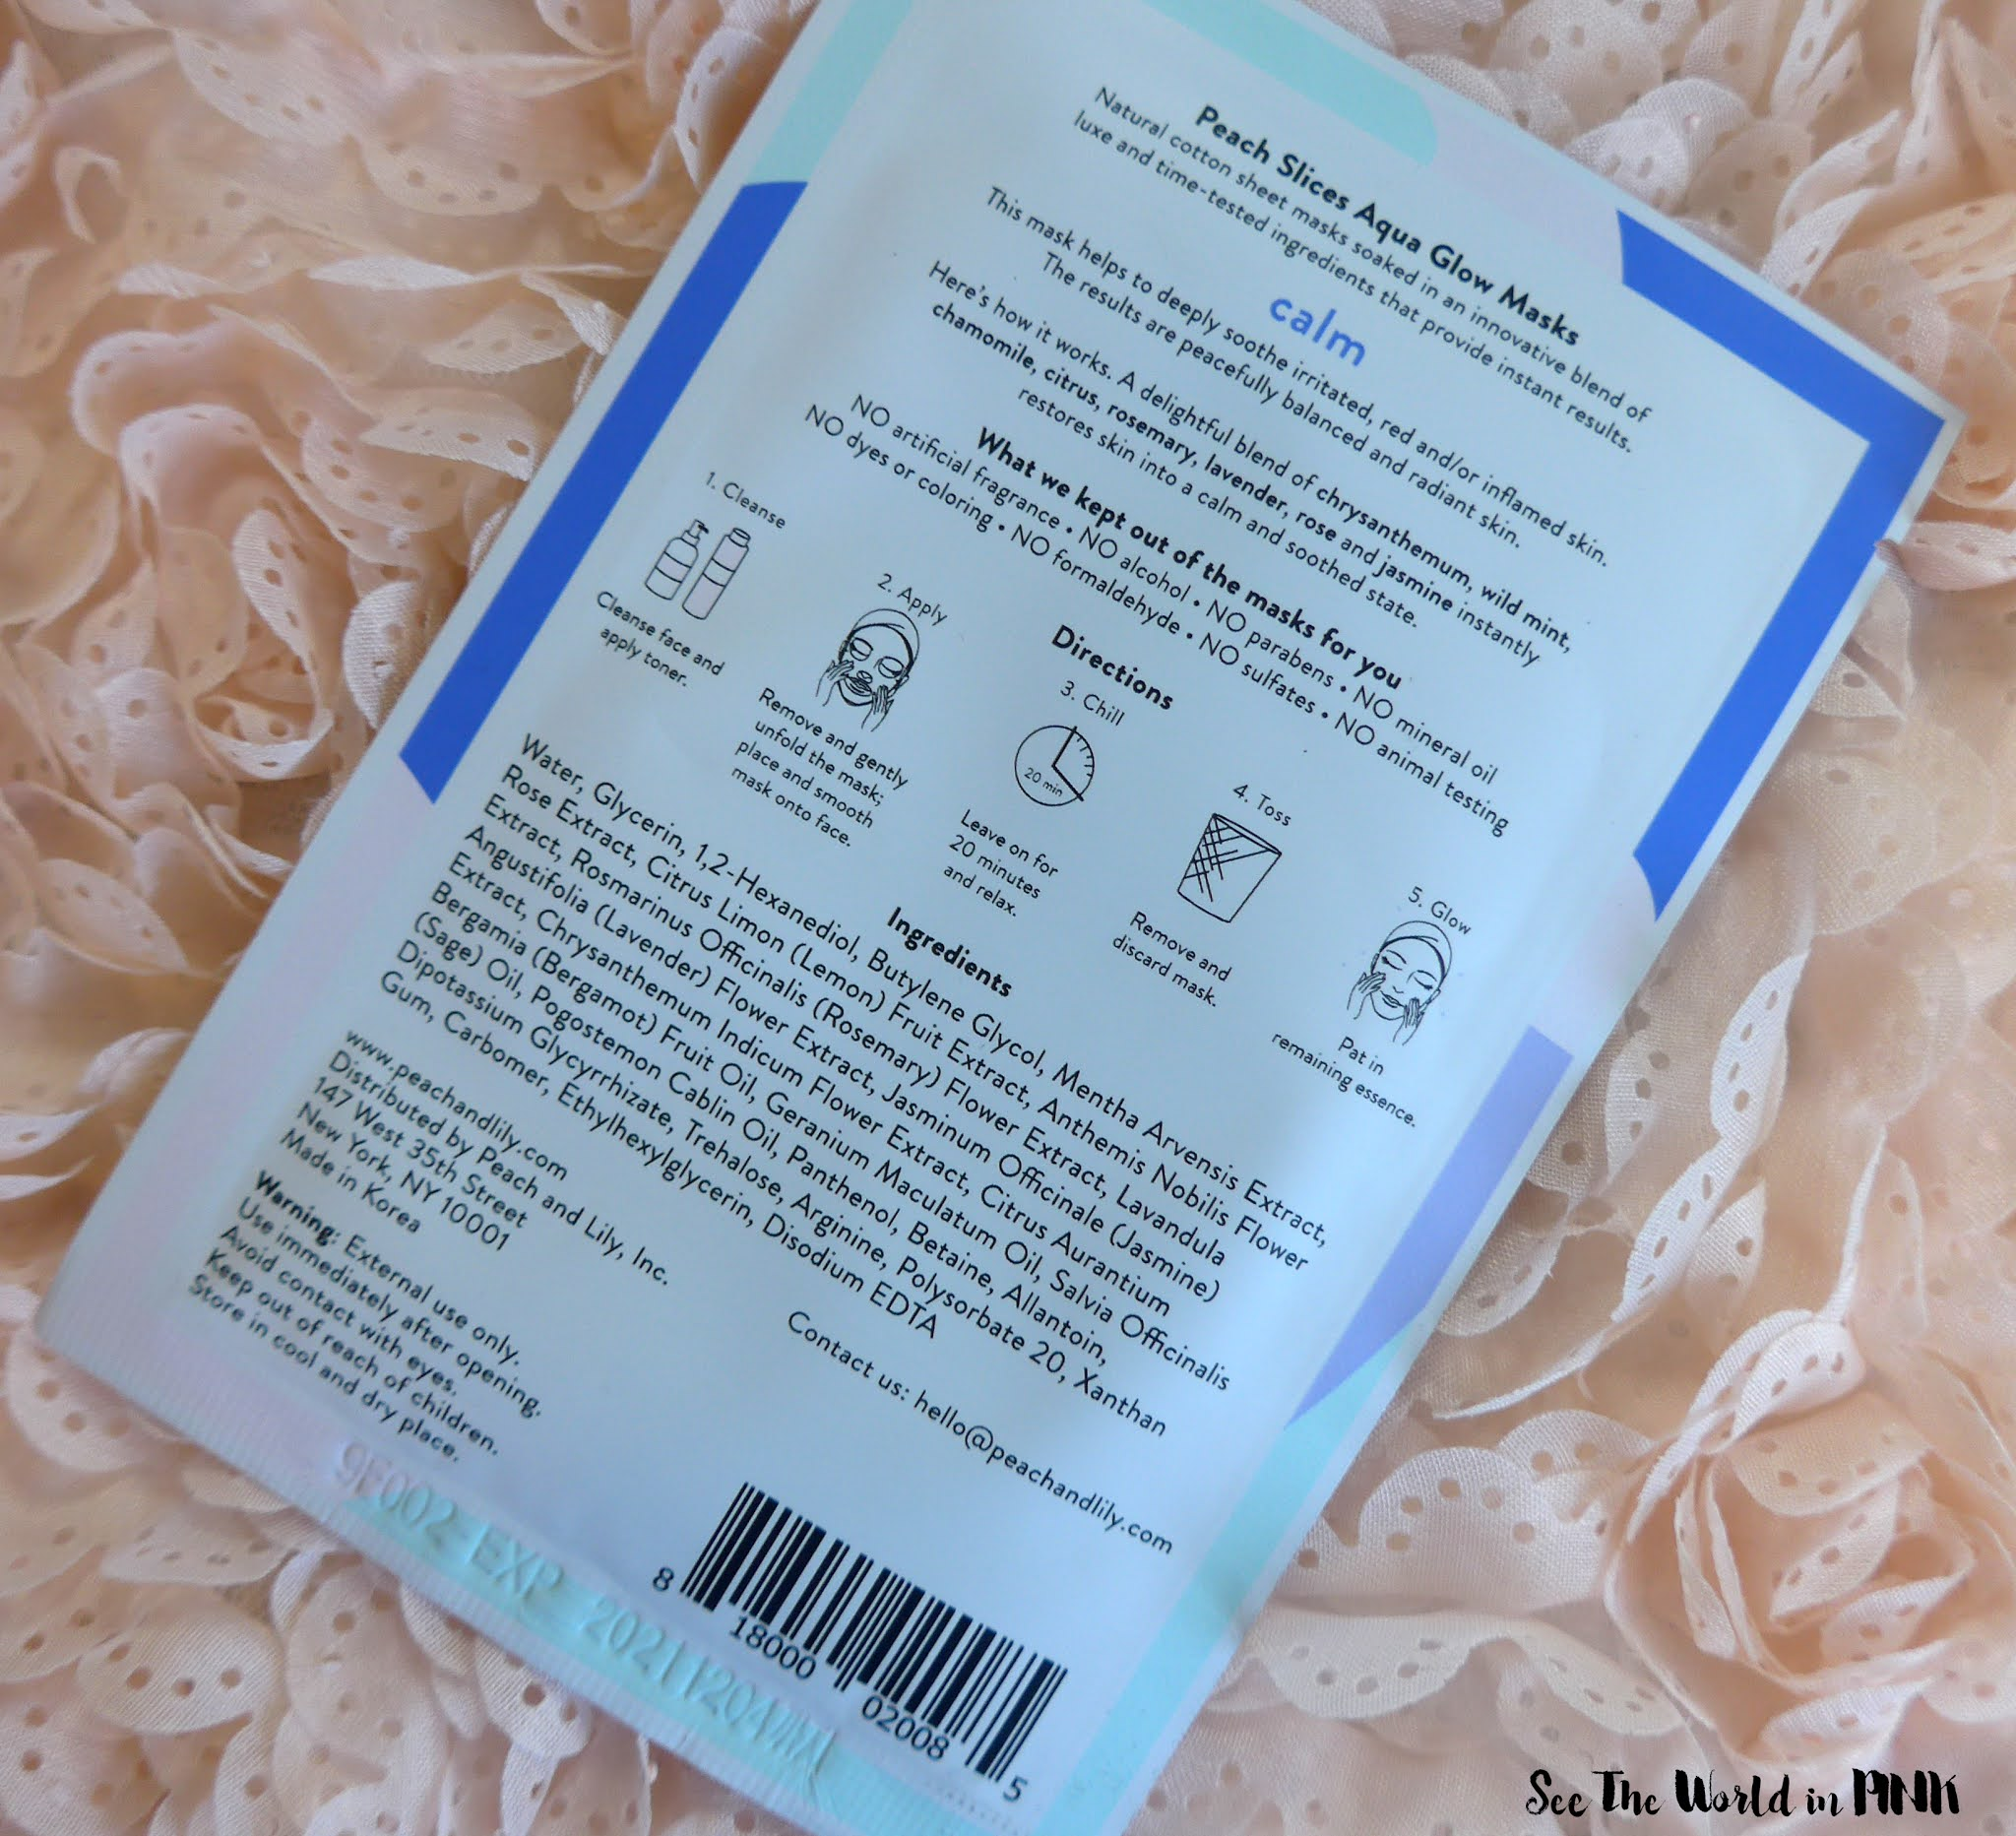 Skincare Sunday - Peach Slices Aqua Glow Sheet Mask Roundup: Hydrate, Brighten, Firm, Shrink Pores, Clarify and Calm!